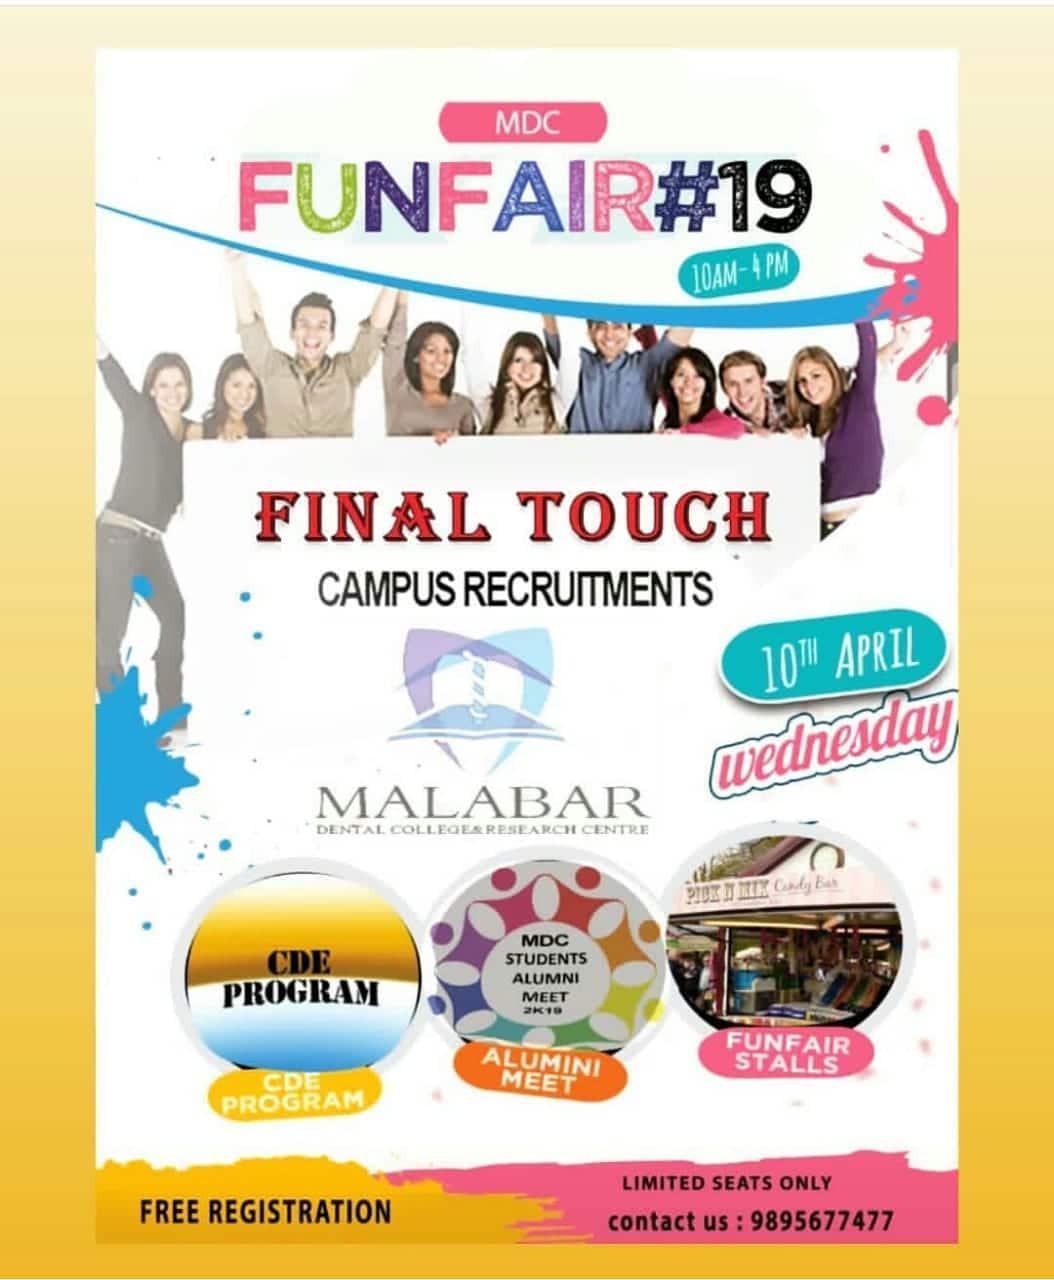 FUNFAIR#19 ON 10th April  FINAL TOUCH Campus RECRUITMENTS, CDE PROGRAM, ALUMNI MEET, FUNFAIR STALL